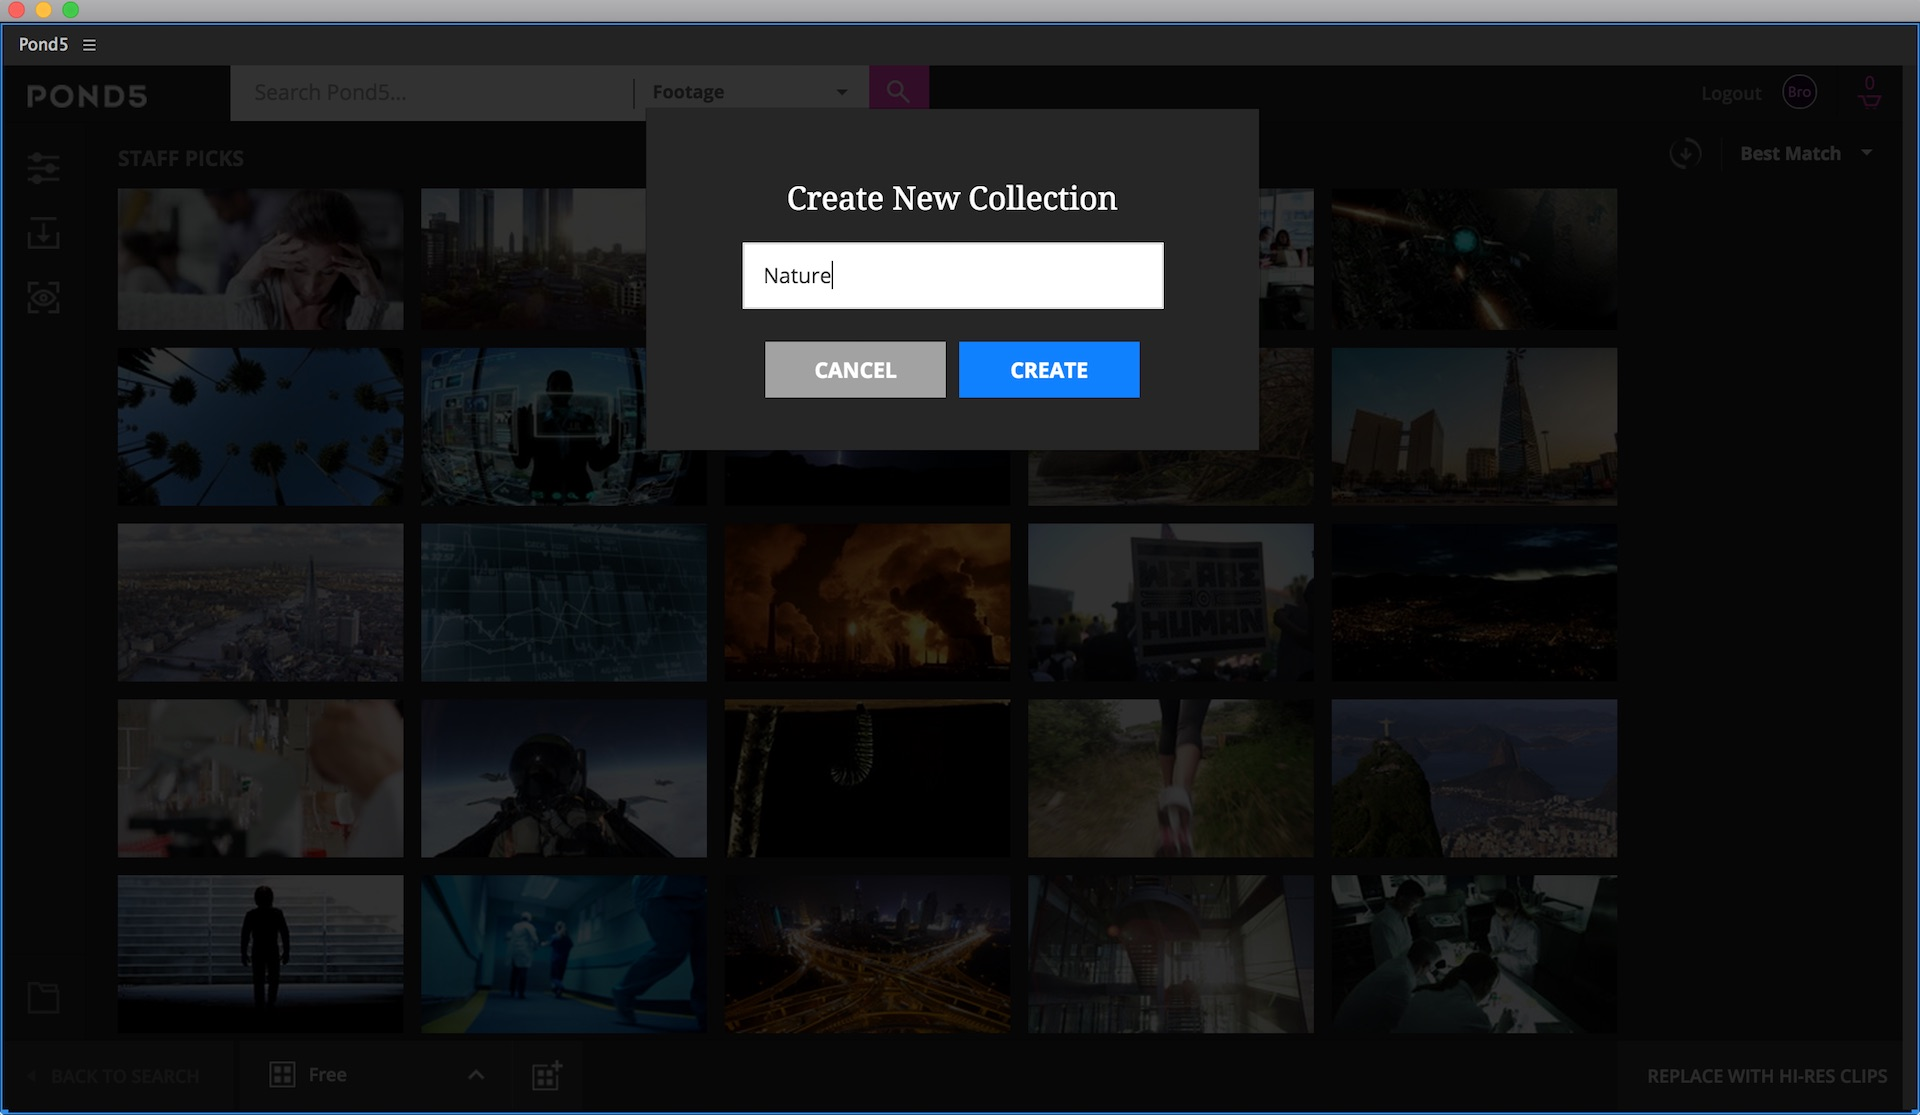 create-collection-pond5-premiere-pro.jpg